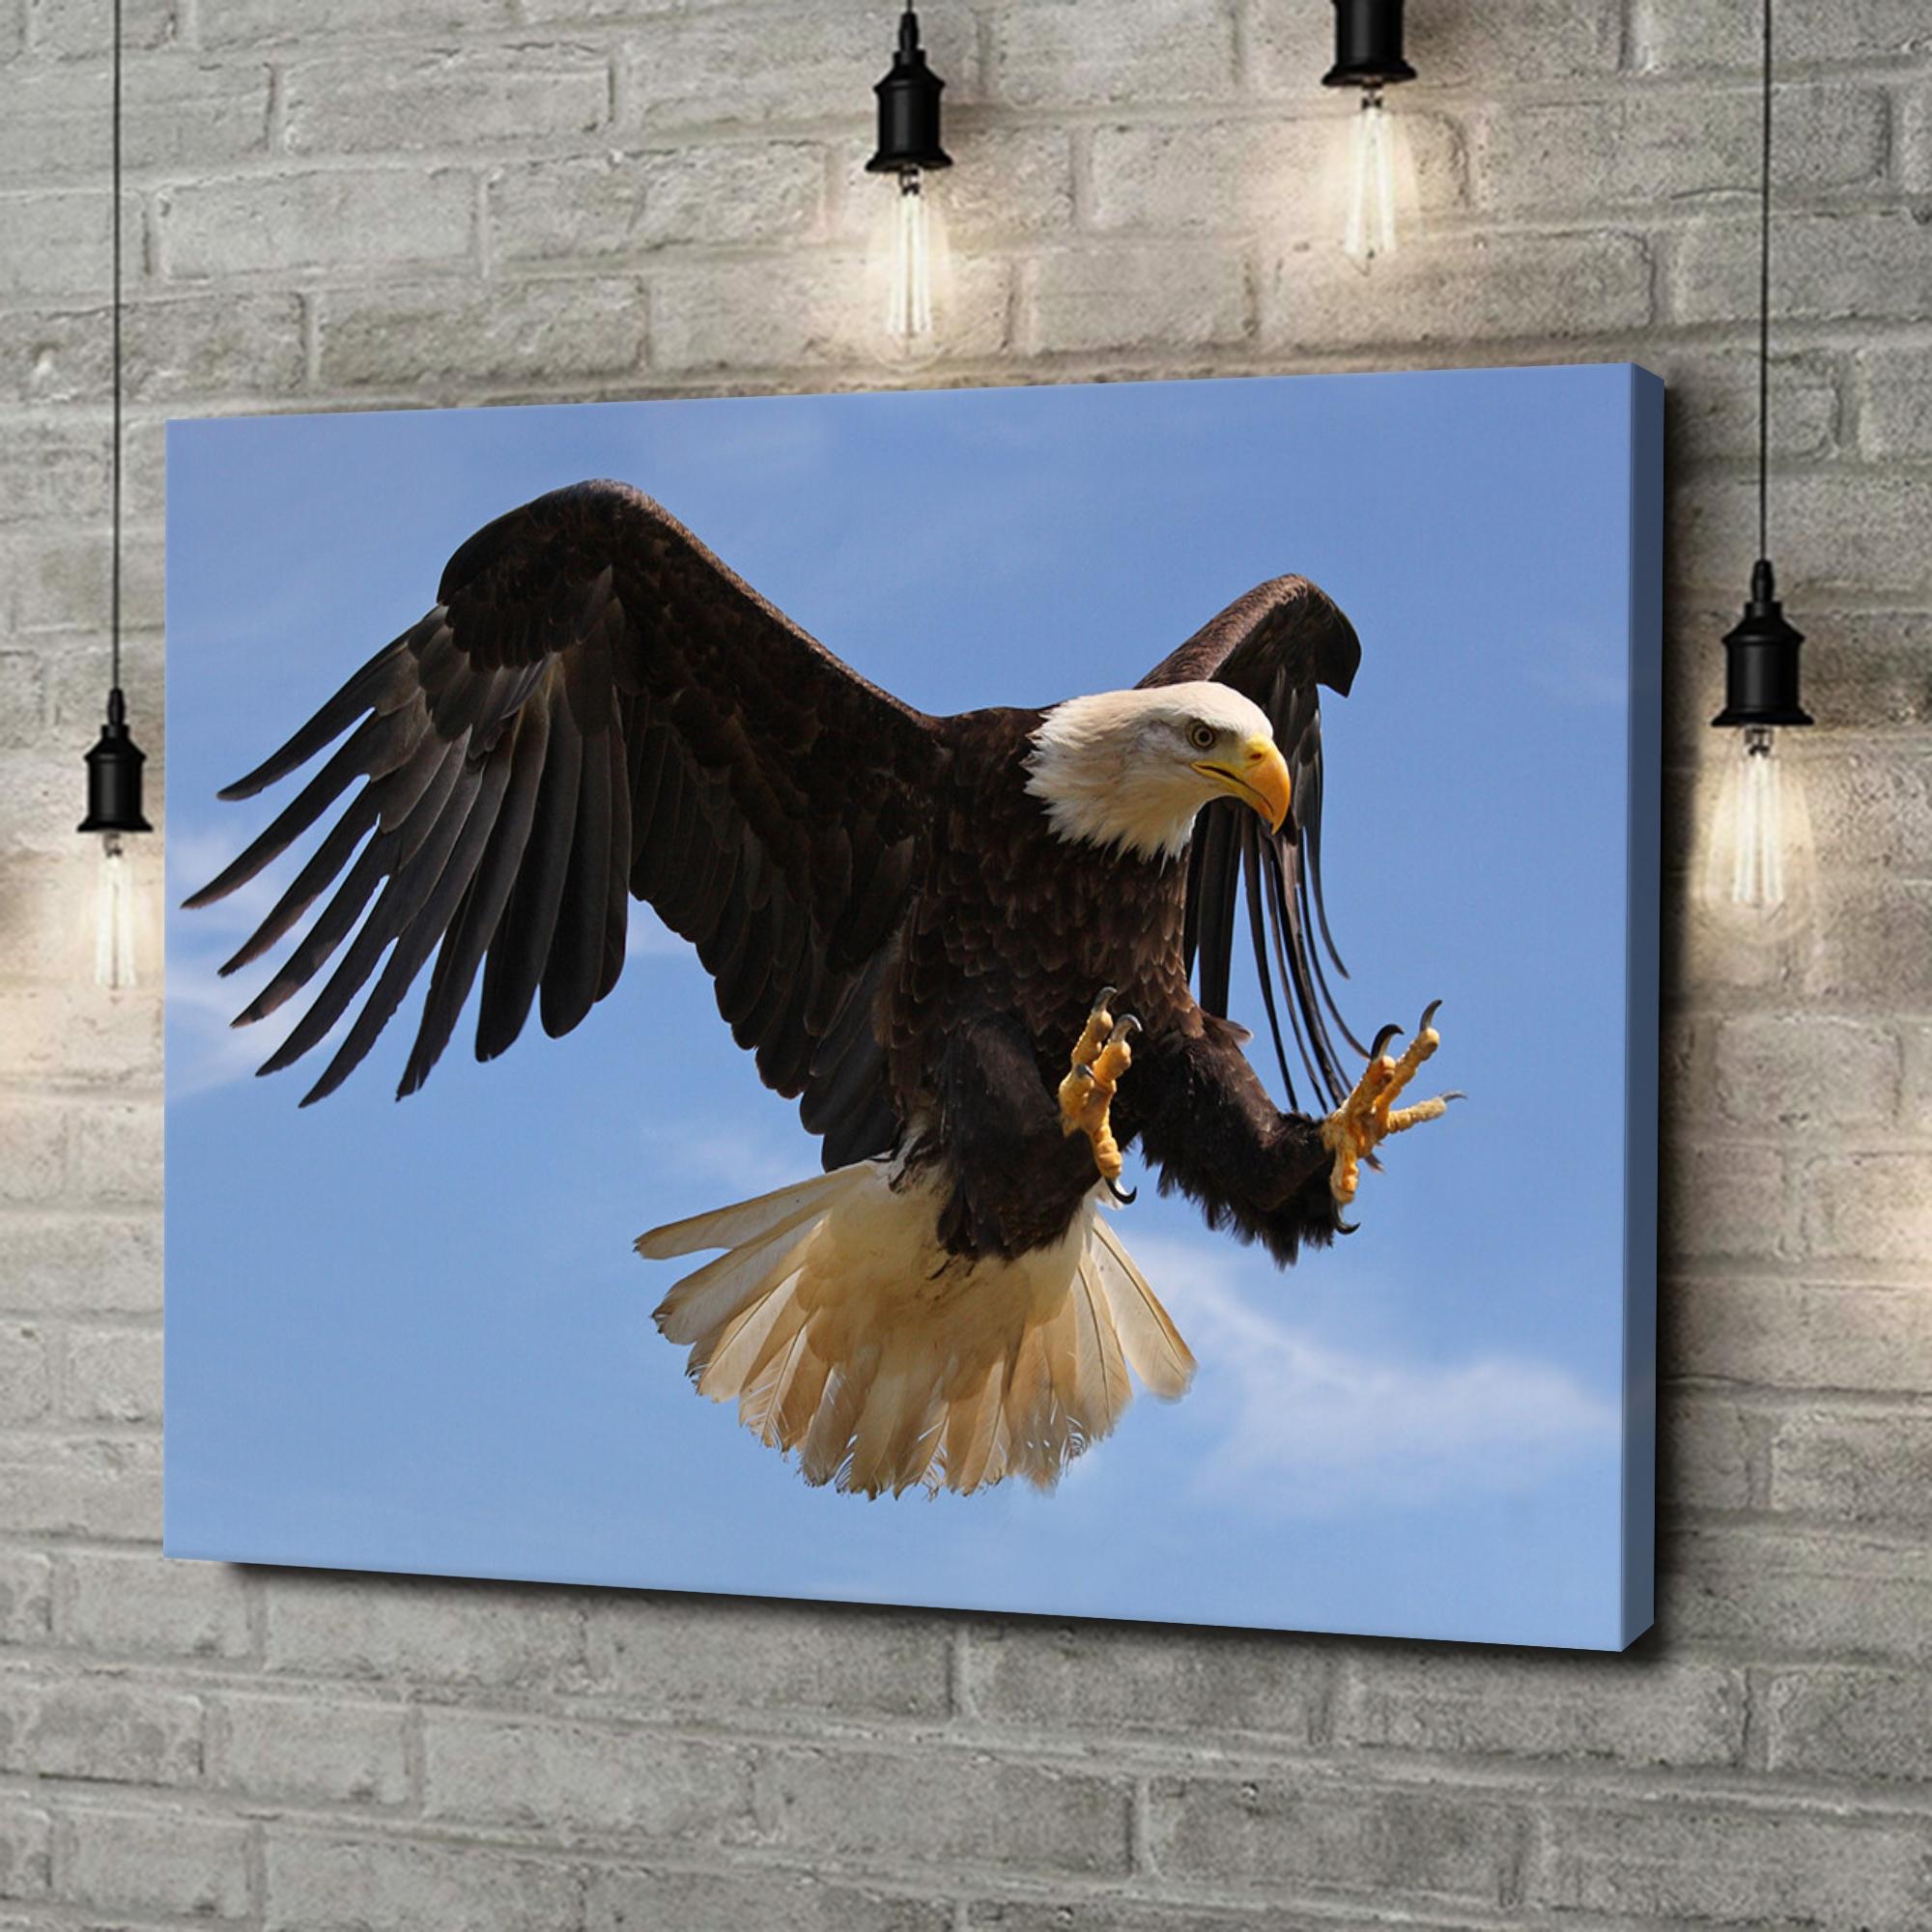 Leinwandbild personalisiert Adler